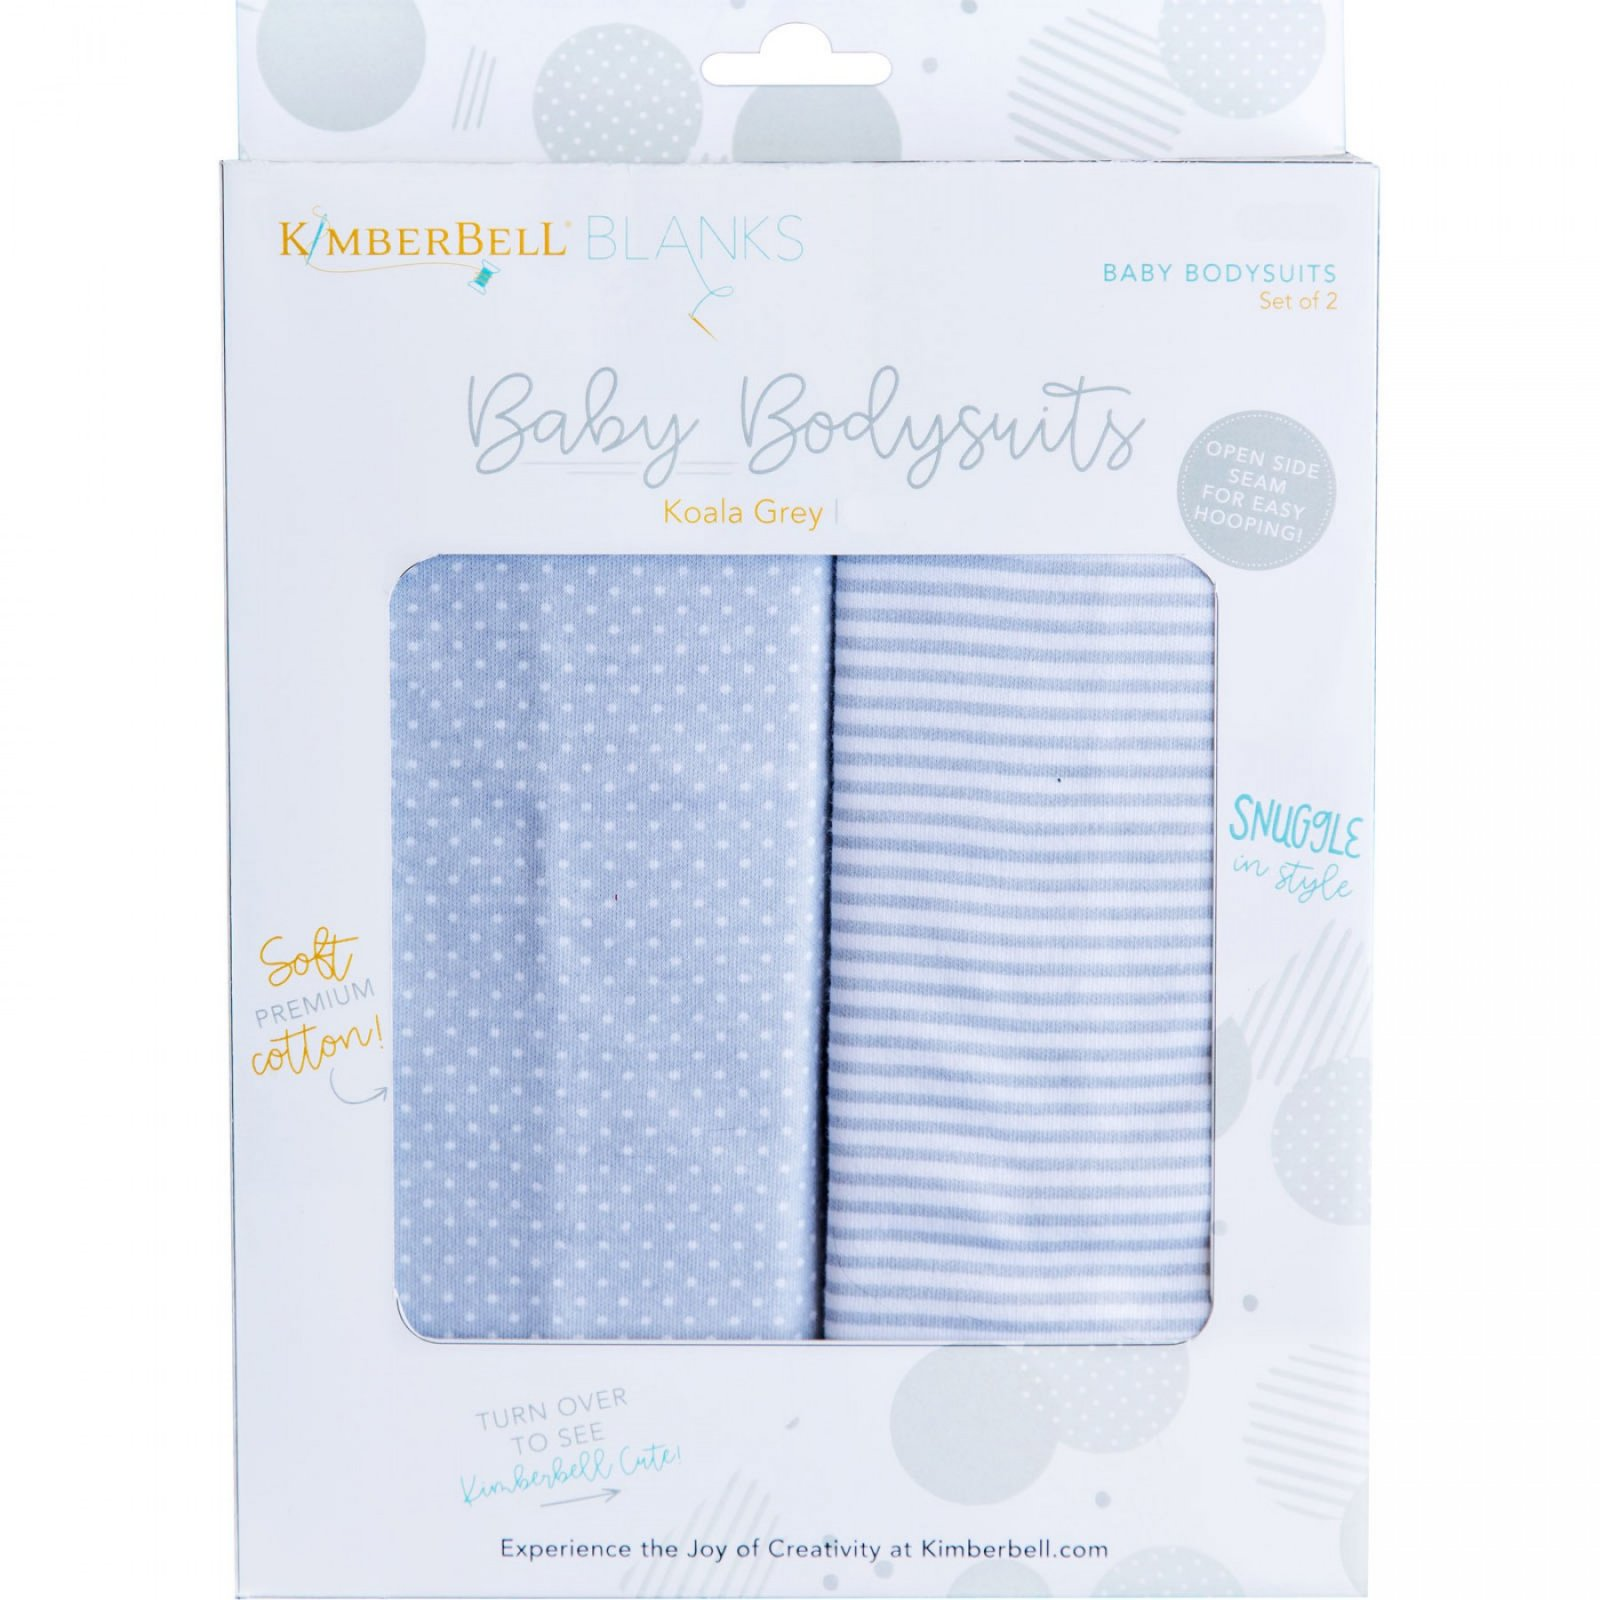 KIDKB217 - 3-6 Mo Koala Grey Baby Bodysuit